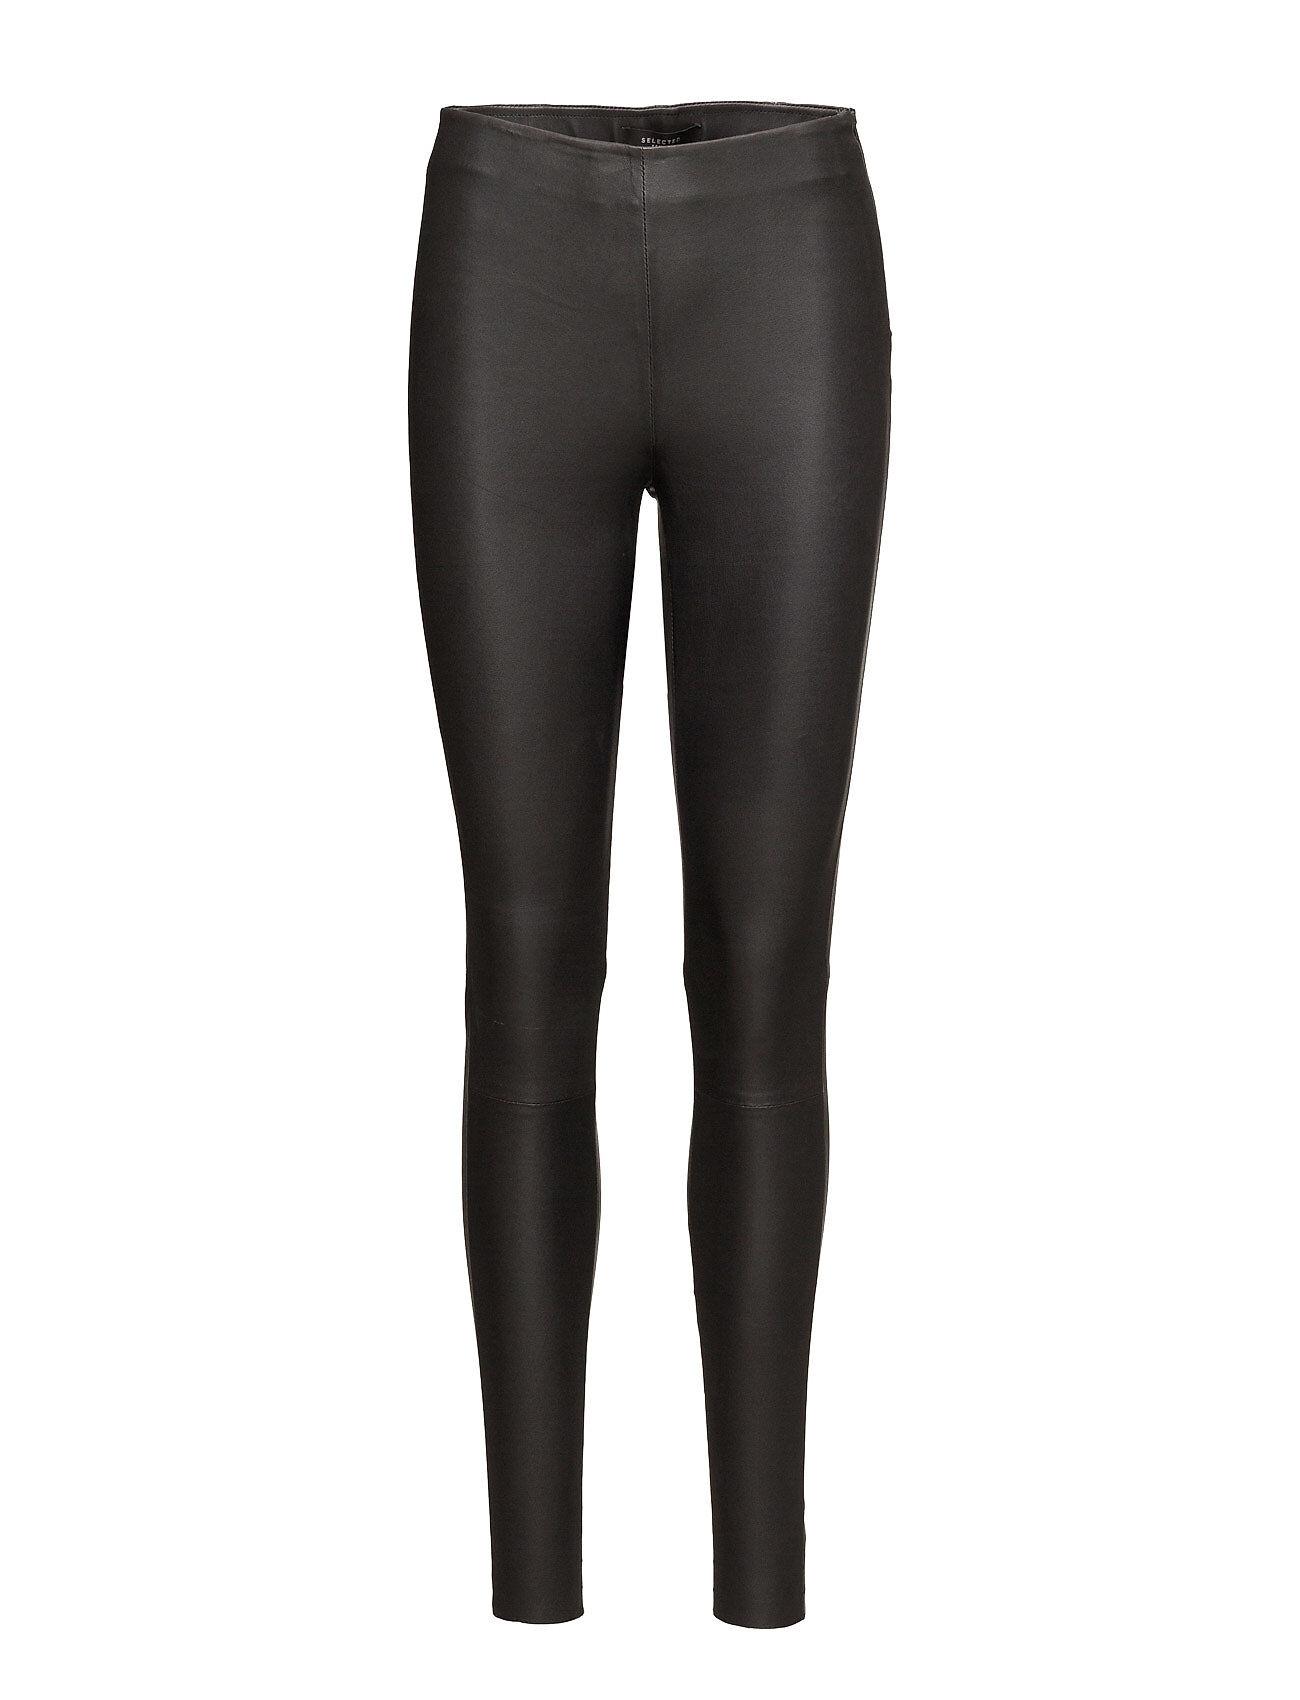 Selected Femme Slfsylvia Mw Stretch Leather Leggin Noos Leather Leggings/Housut Musta Selected Femme